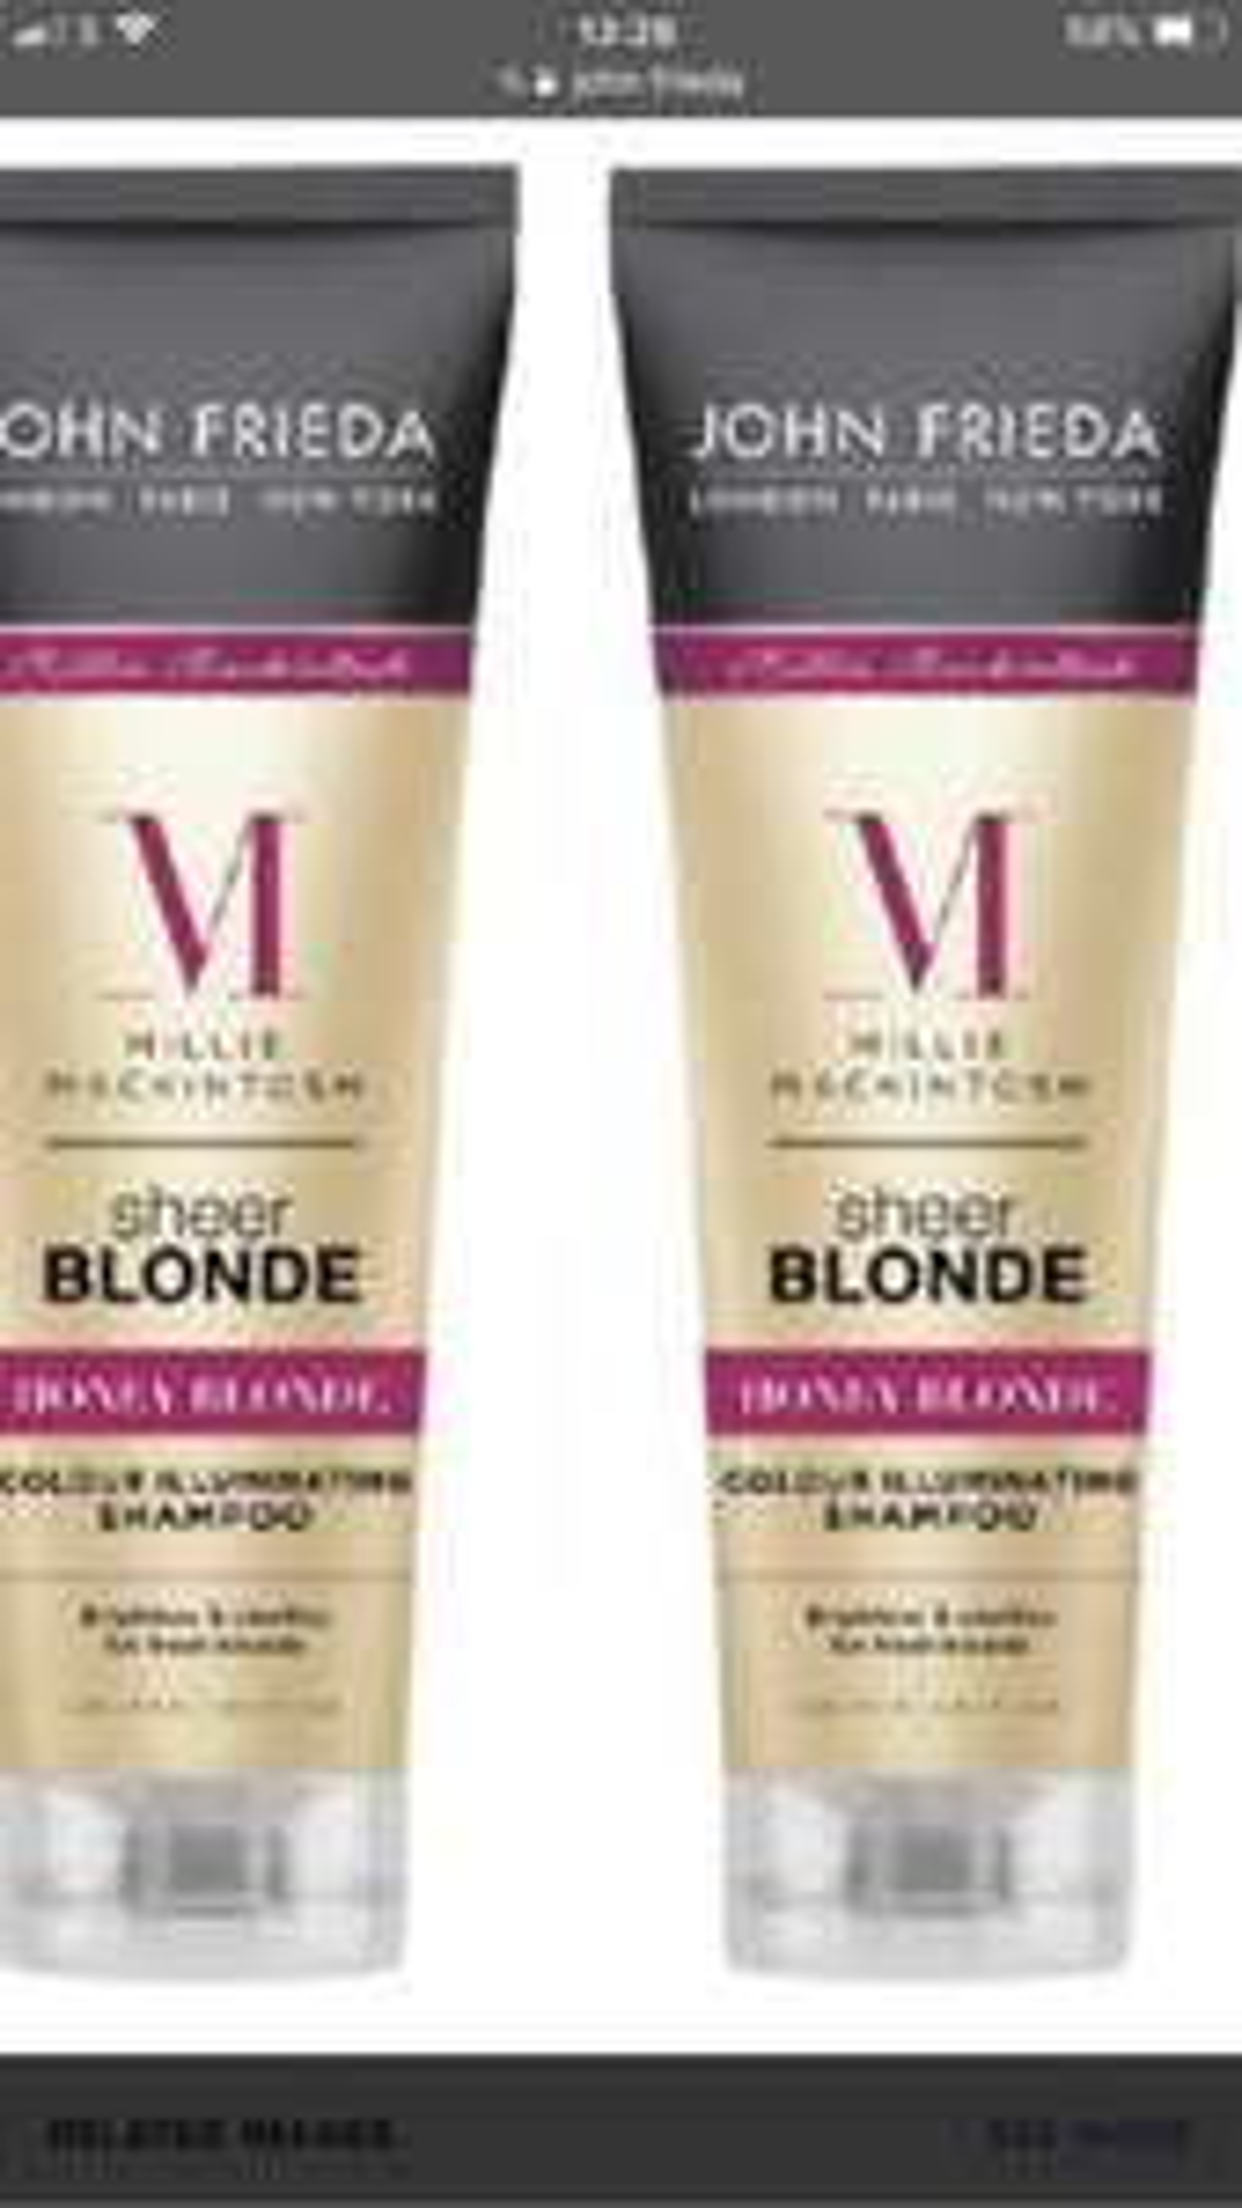 Free John Frieda Shampoo and Hair Colour